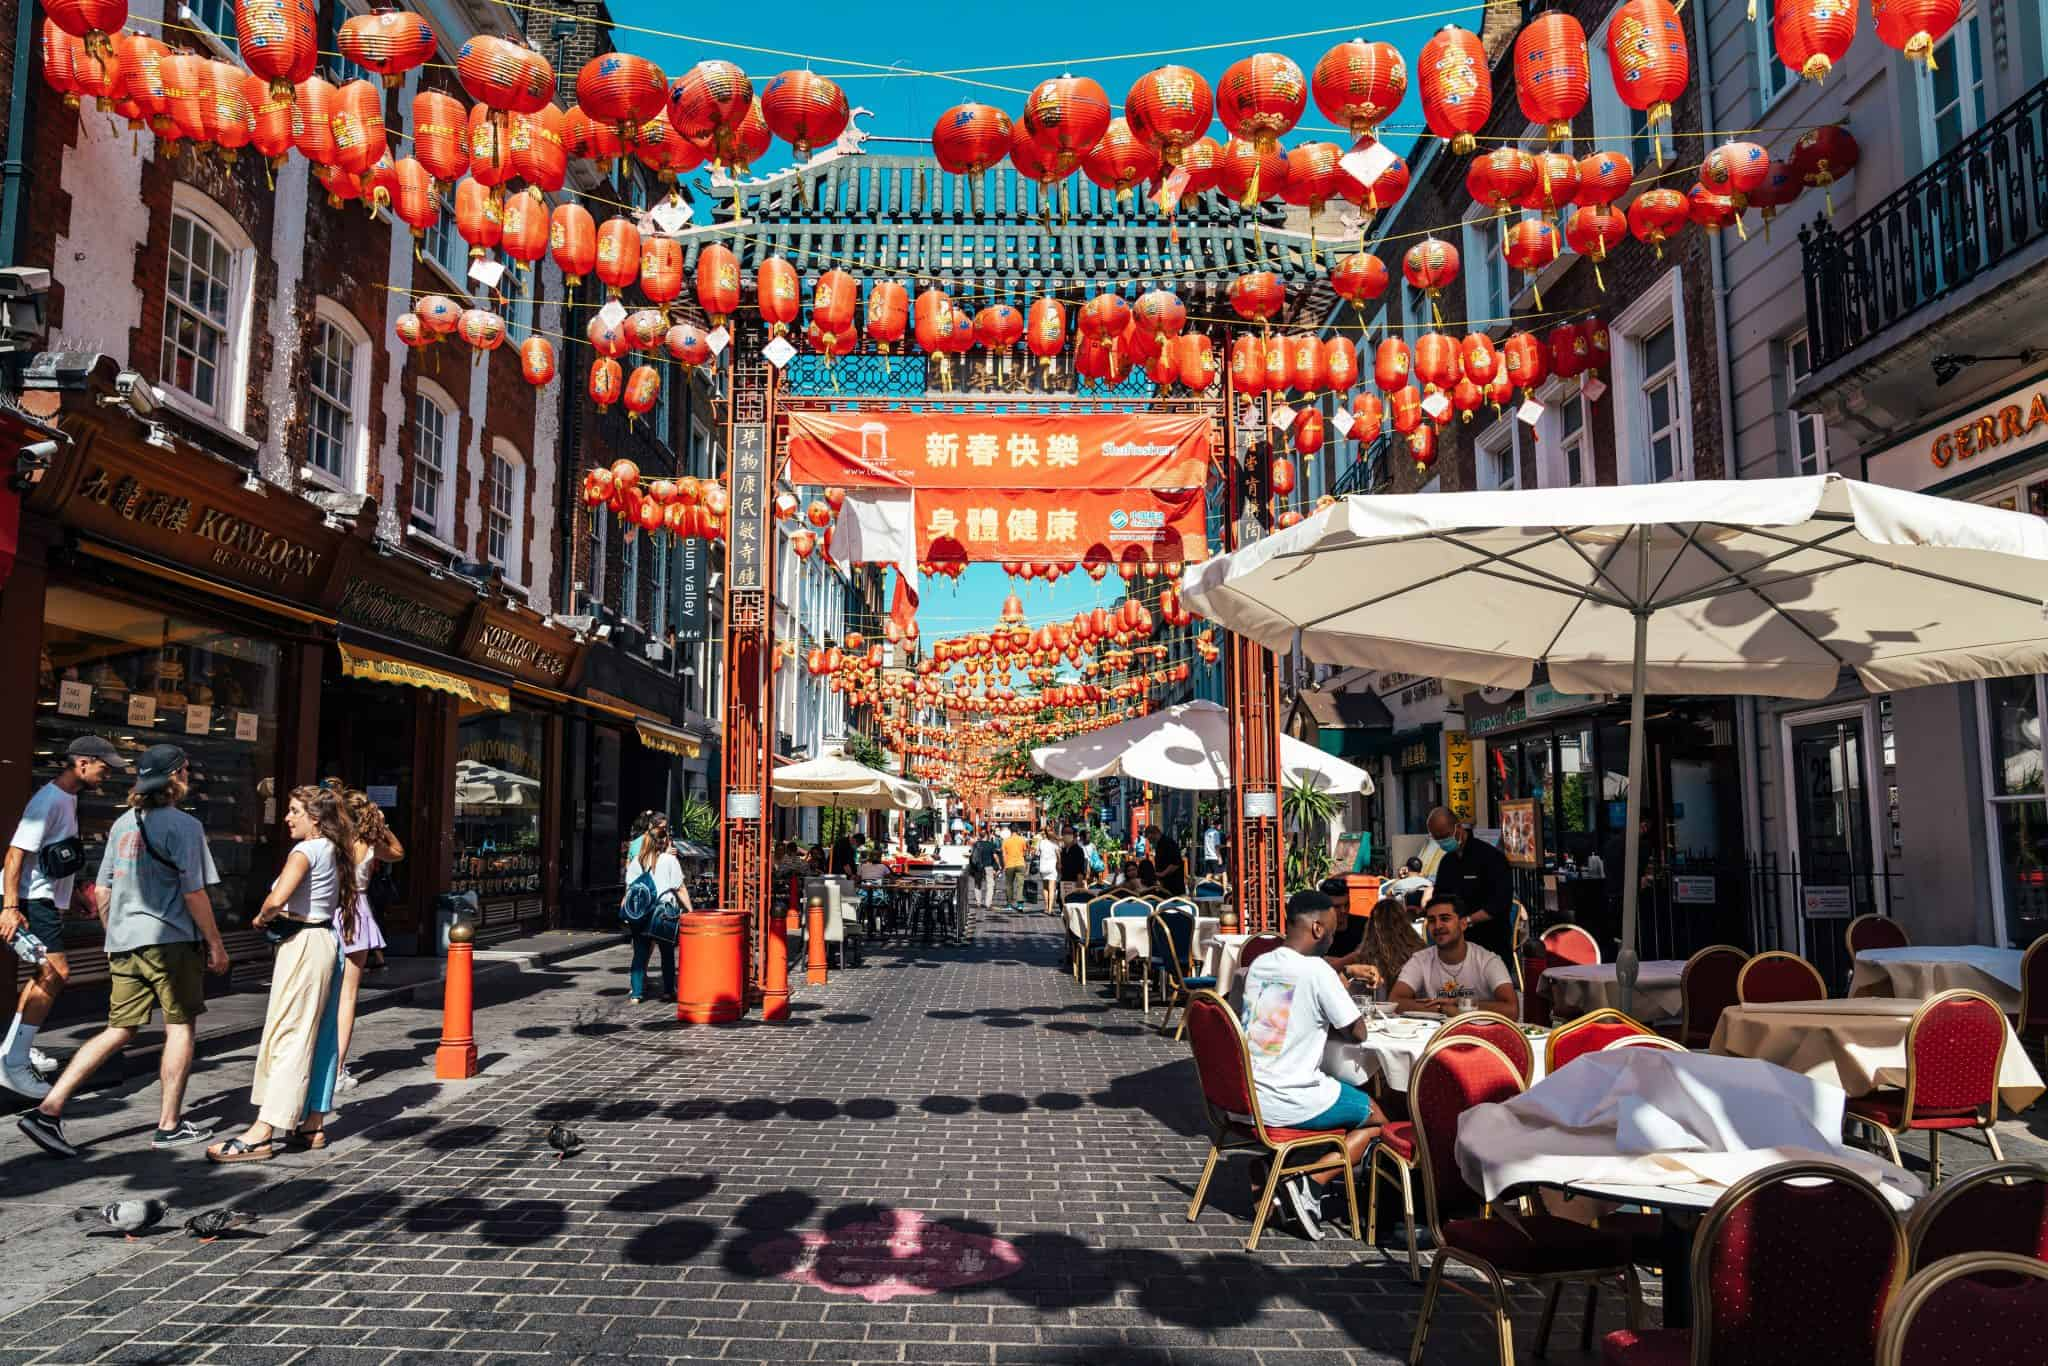 Chinatown outdoor dining al fresco terrace | Photo: @haydonperrior